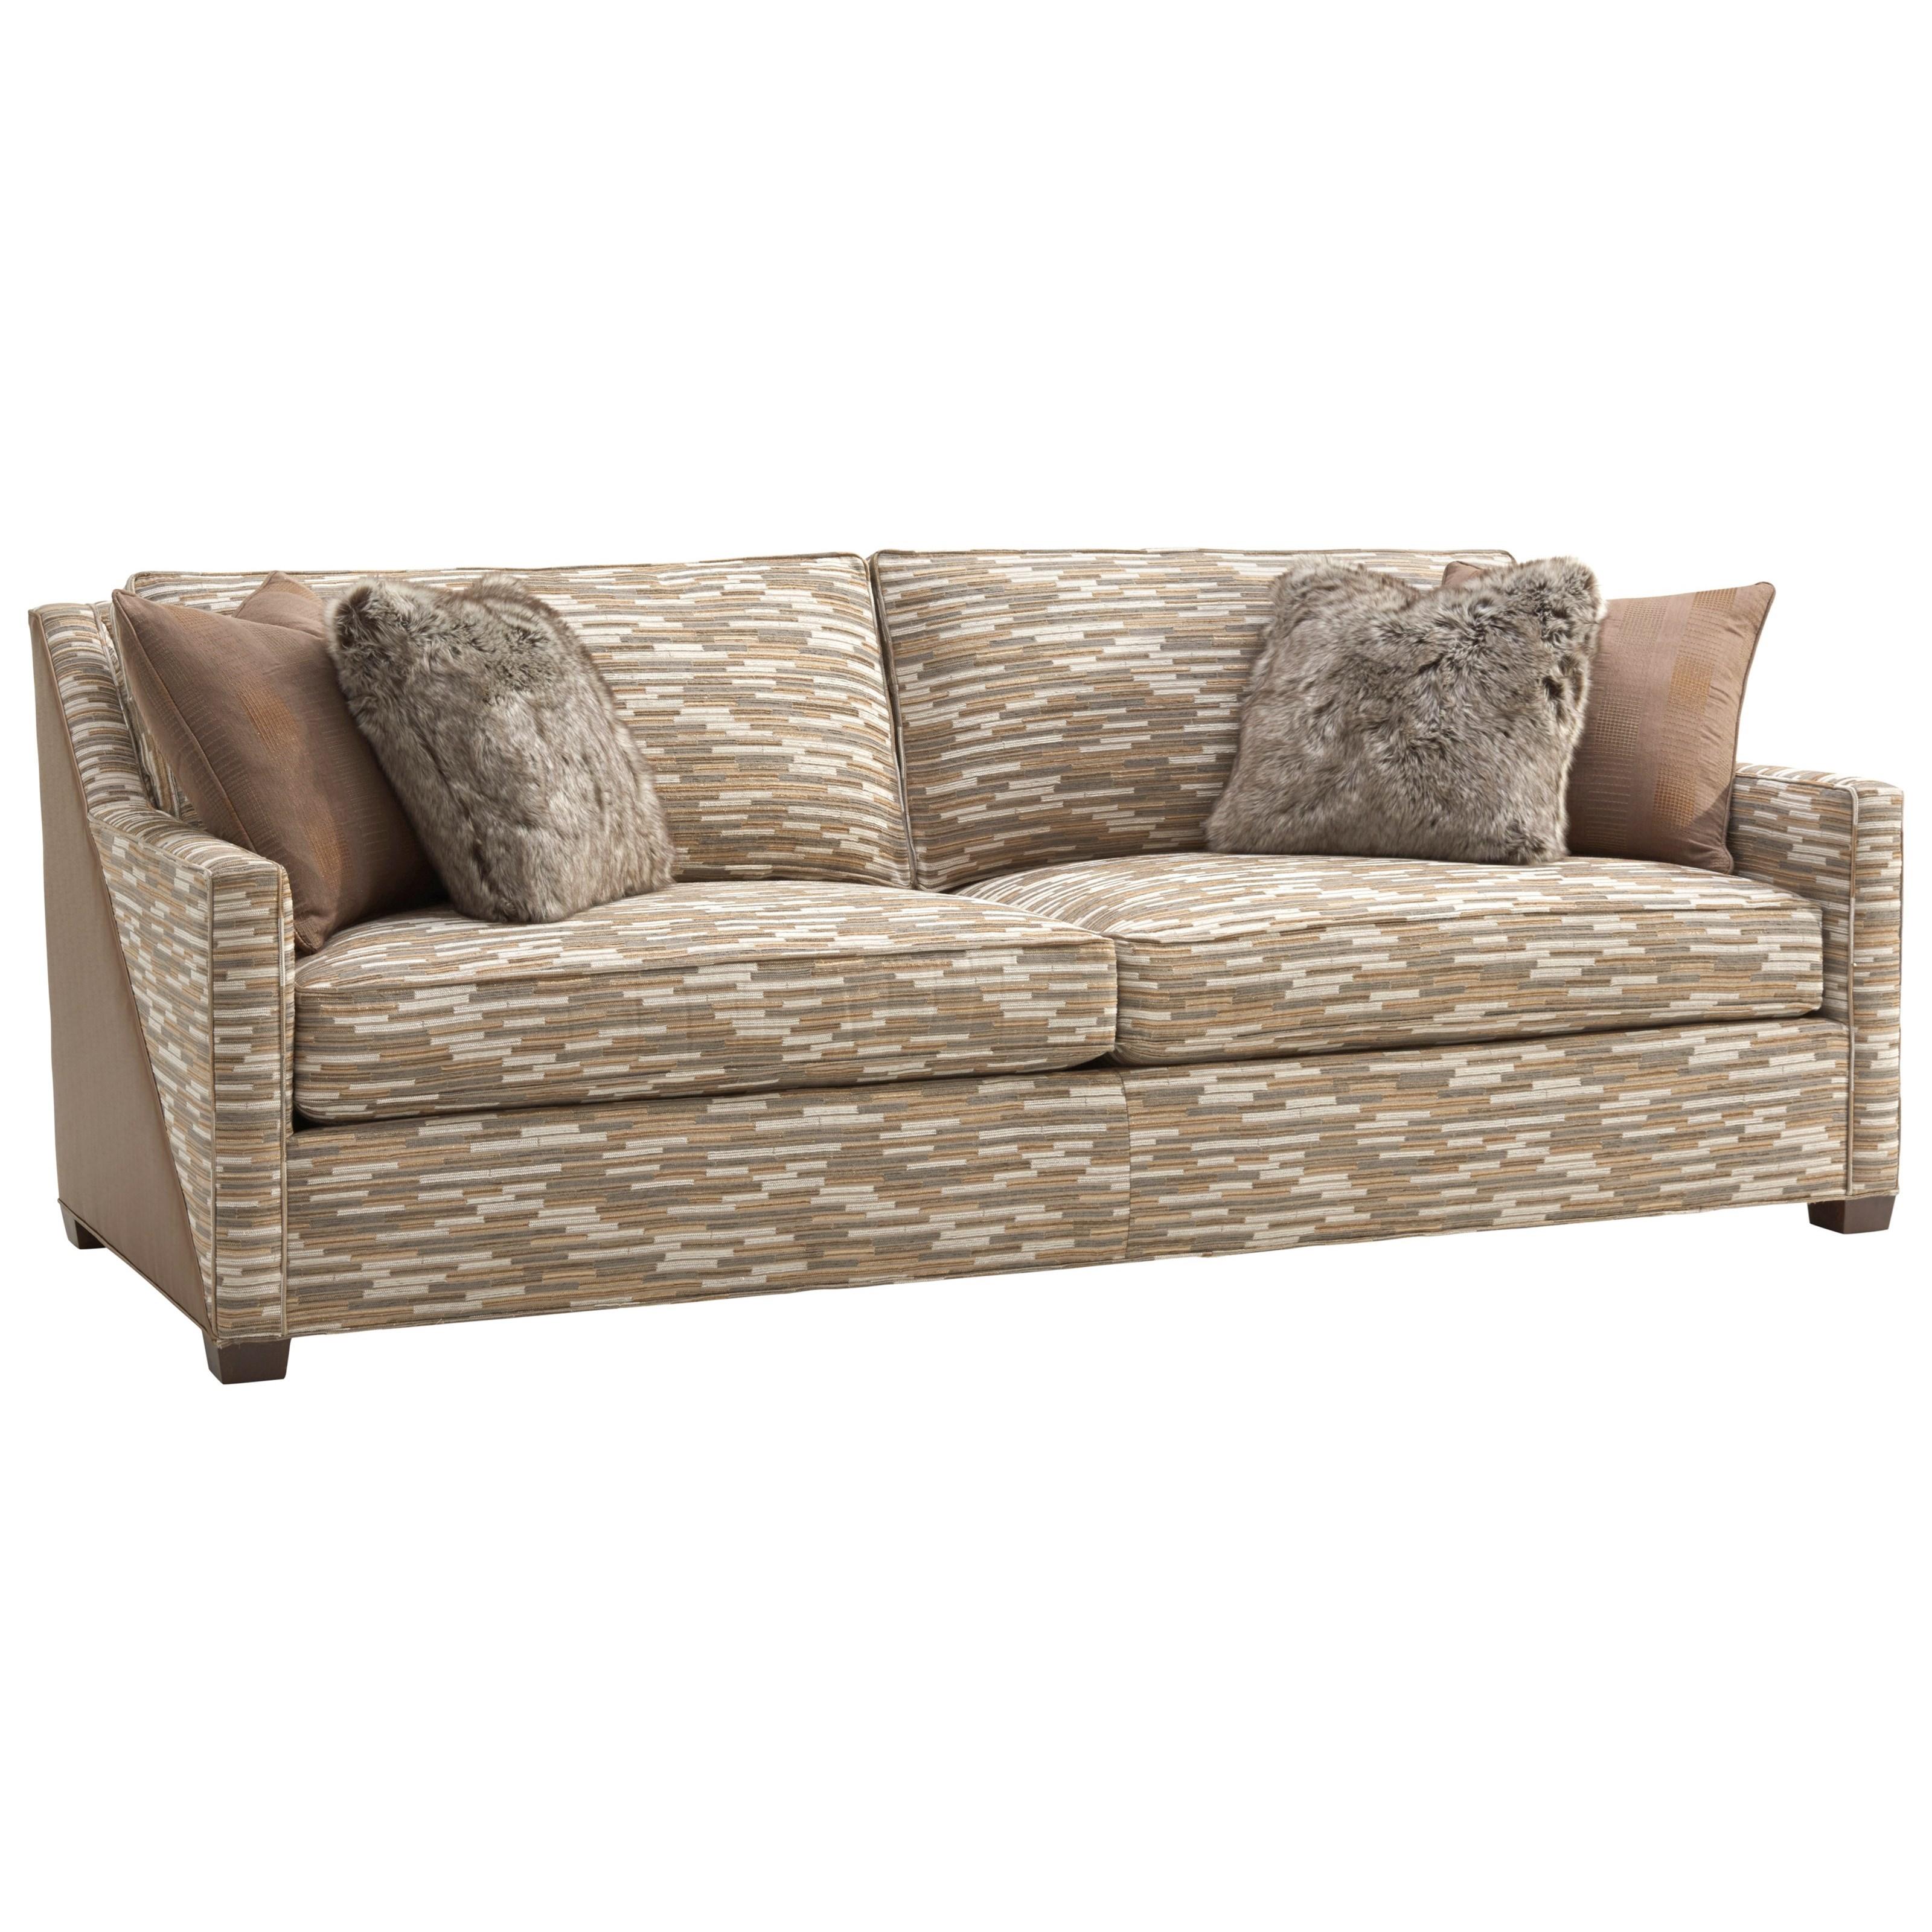 Zavala Wright Sofa by Lexington at Fisher Home Furnishings